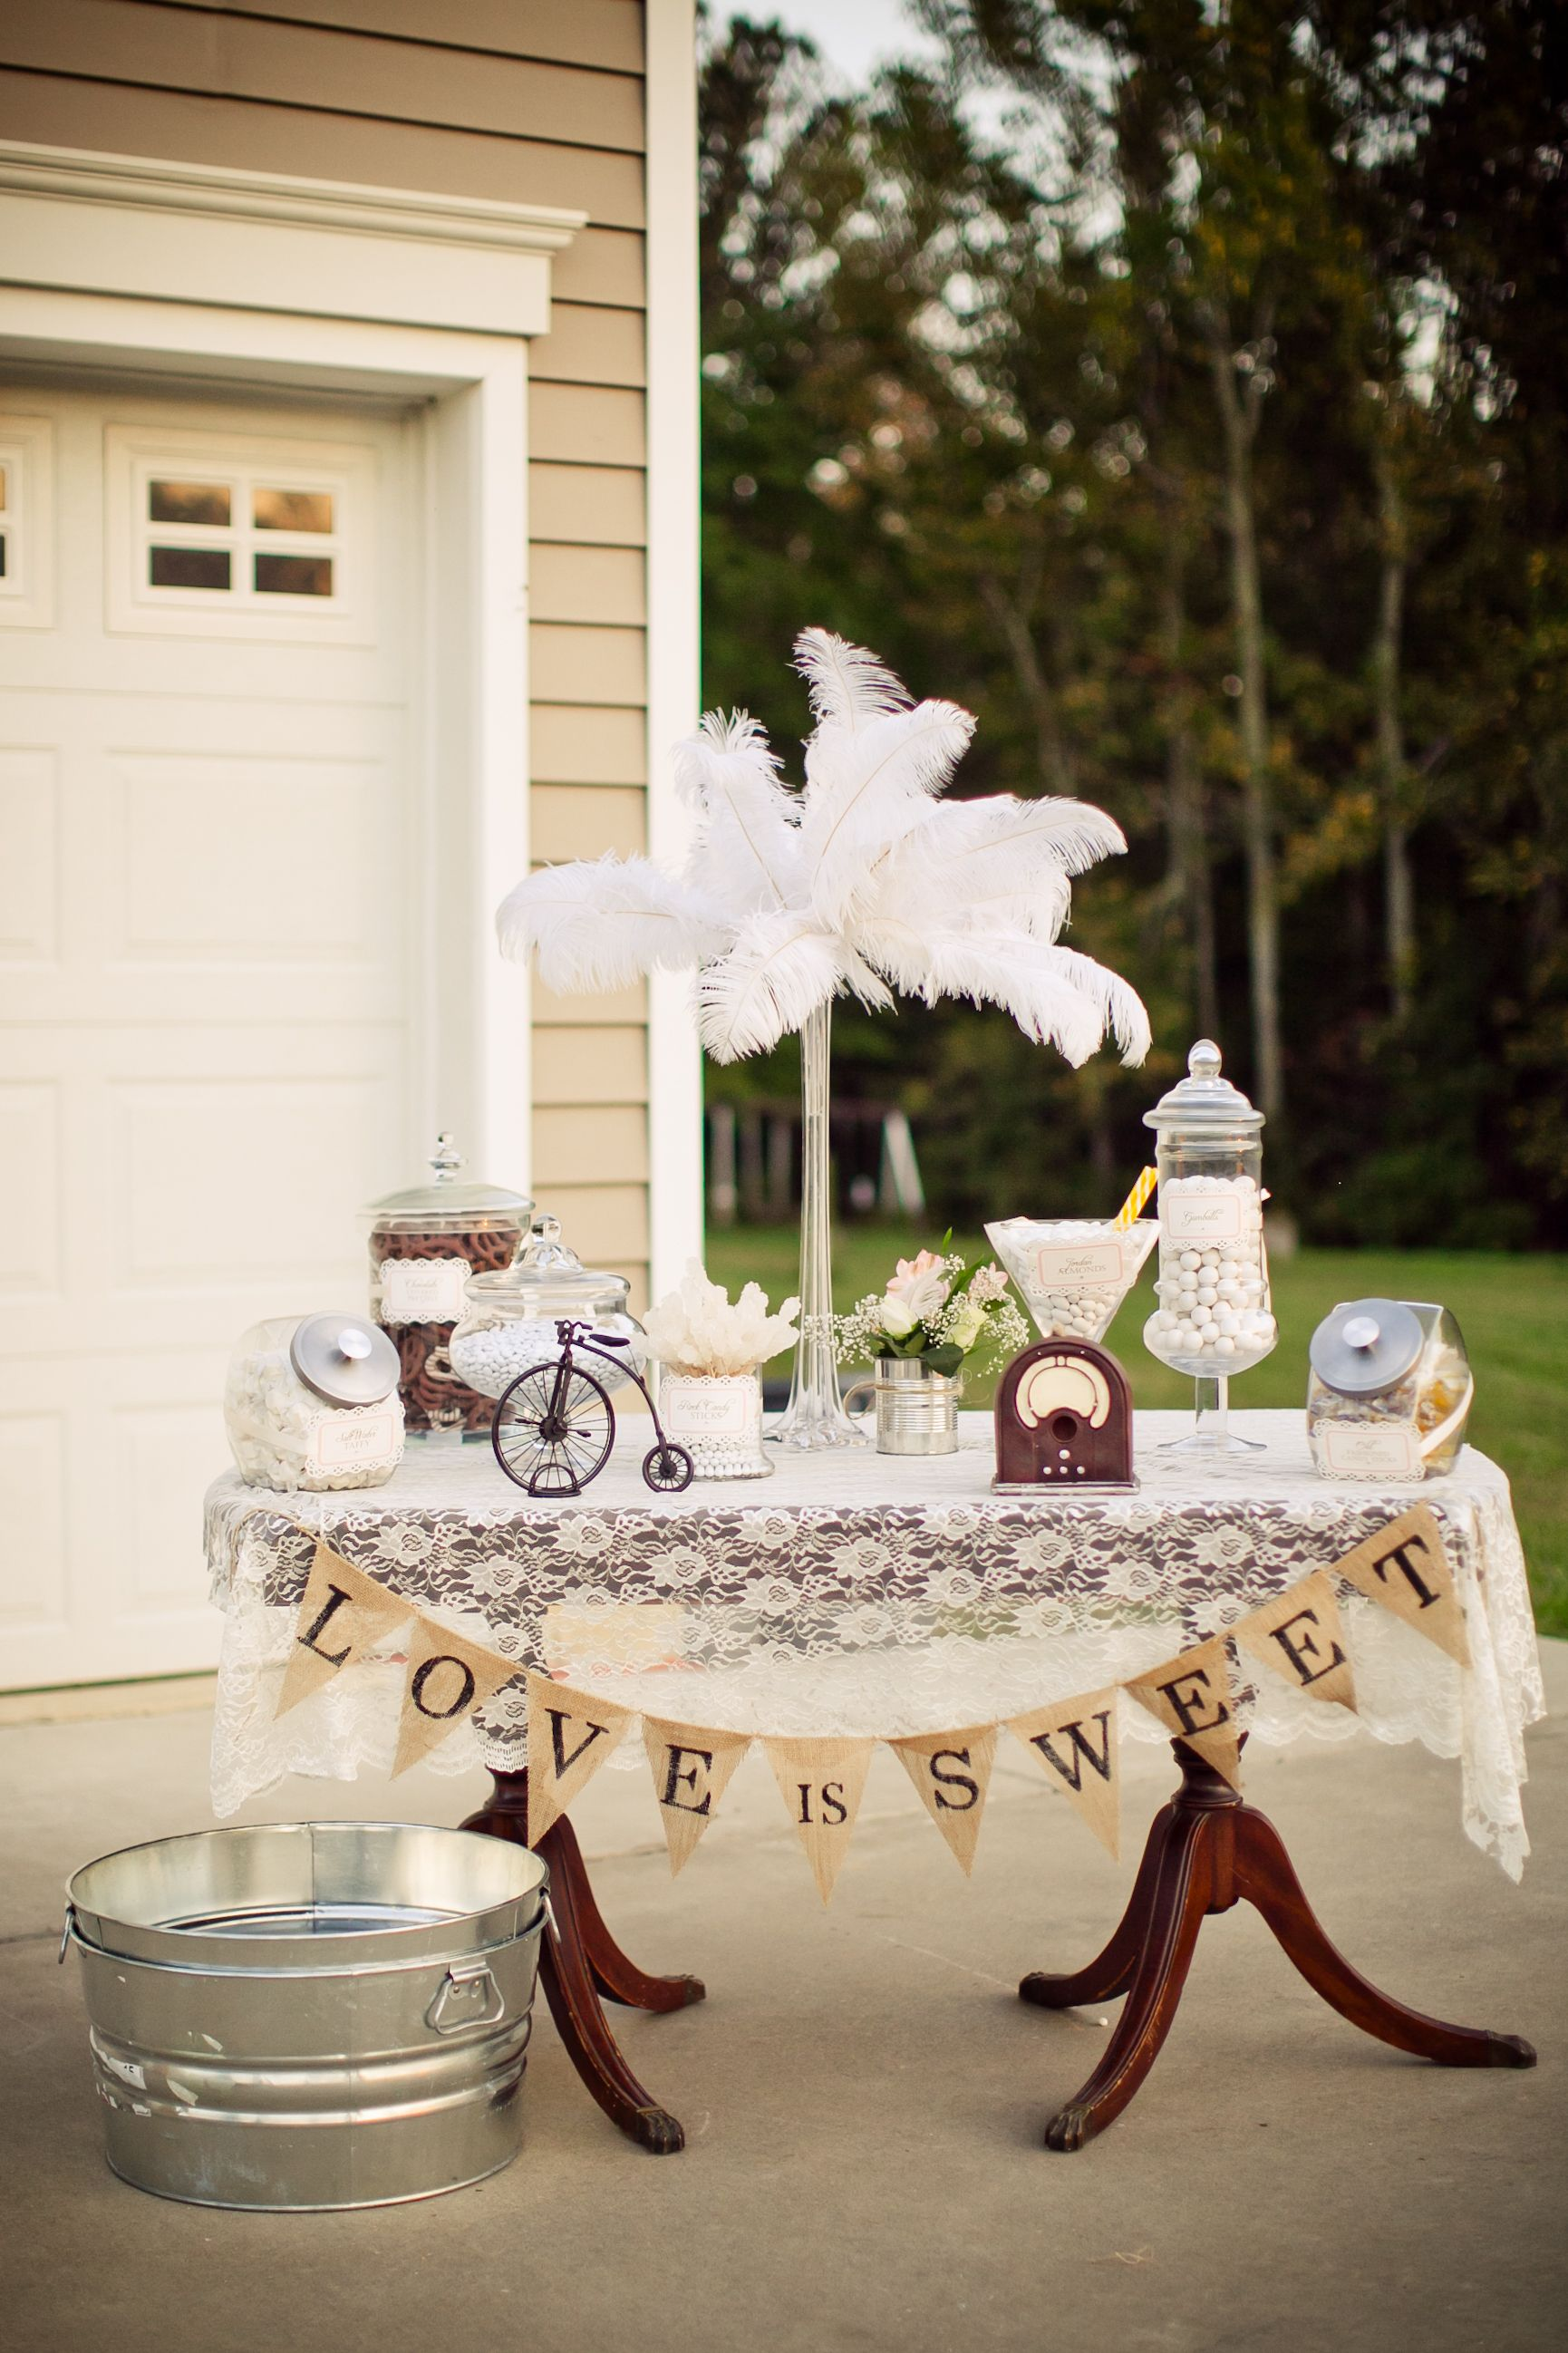 1920's candy |  wedding ideas | diy wedding crafts vintage 1920's